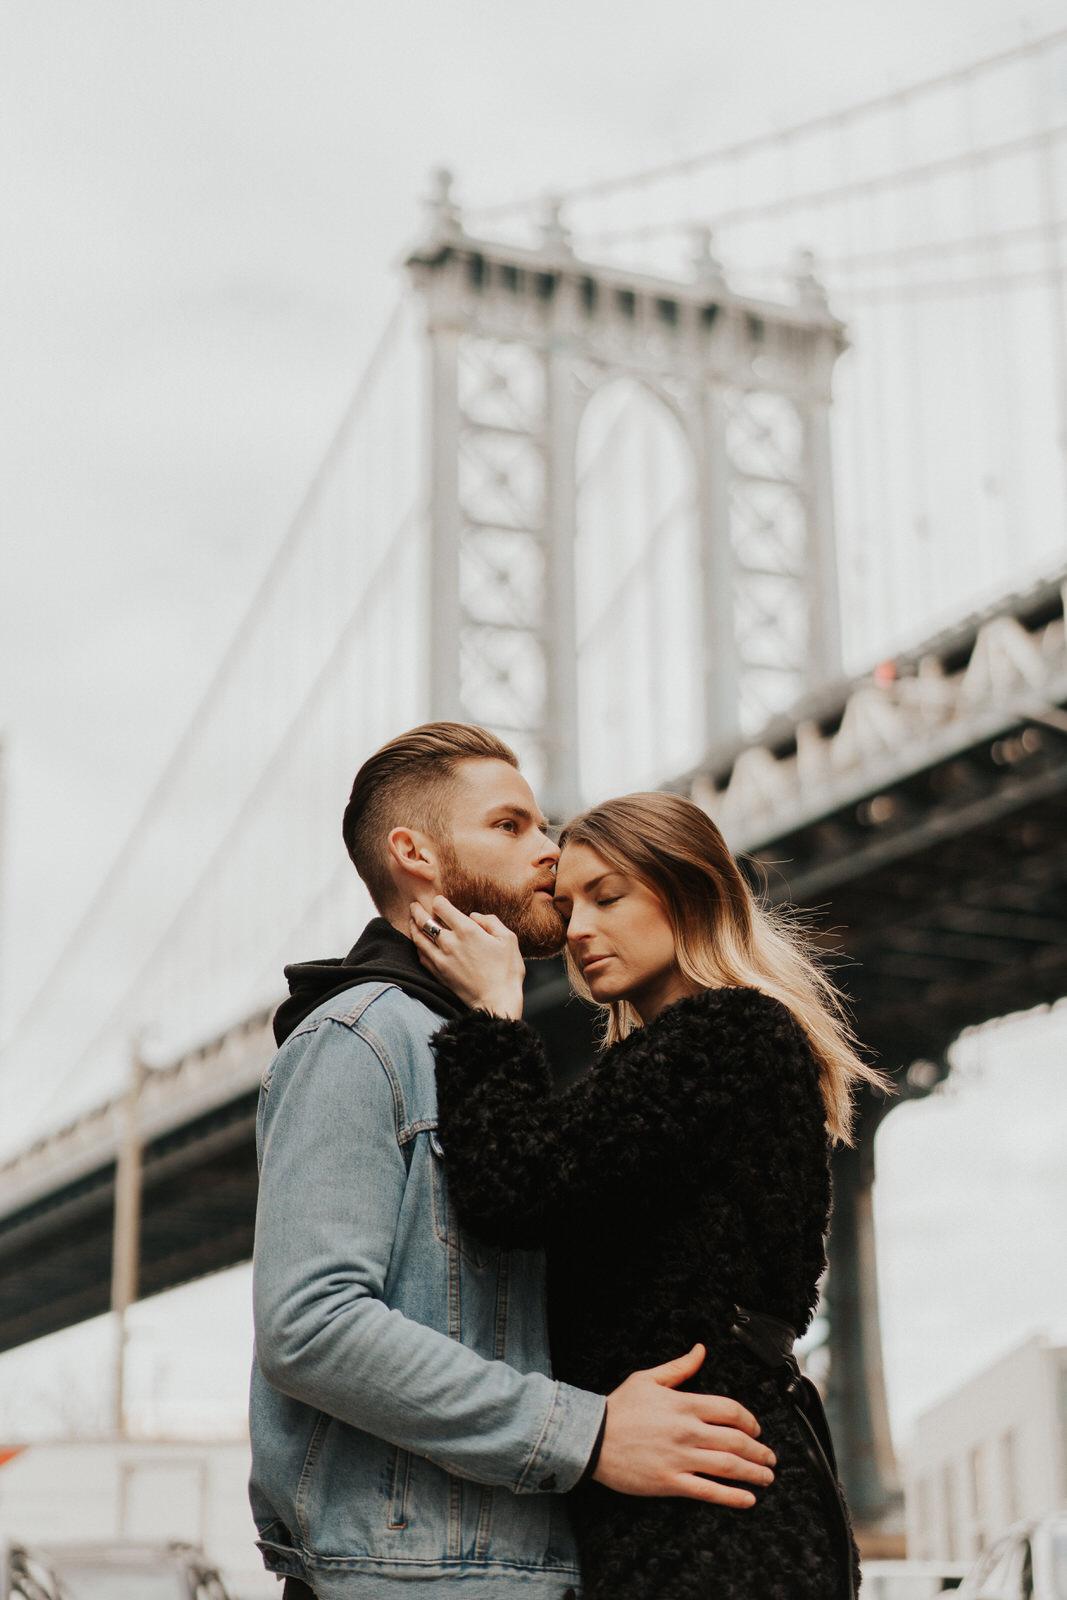 NYC-engagement photographer-dumbo-brooklynn-49.jpg